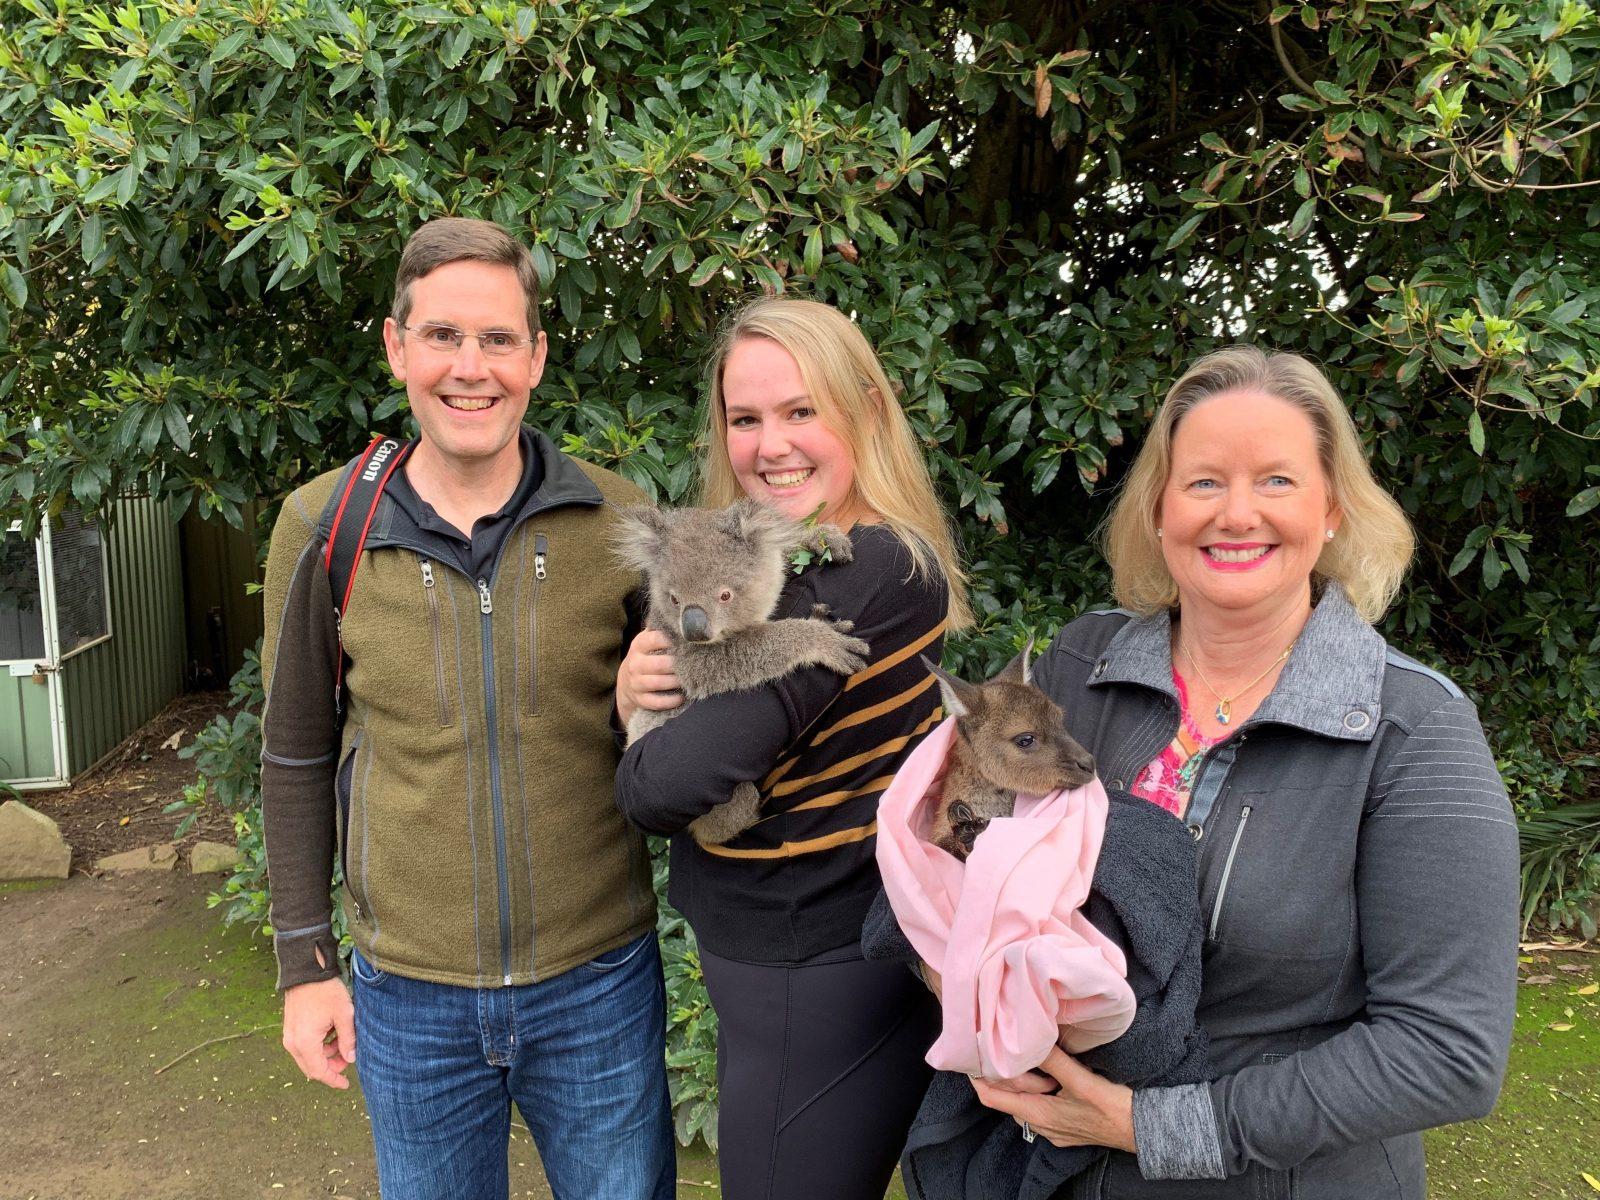 Guests at KI Wildlife Park